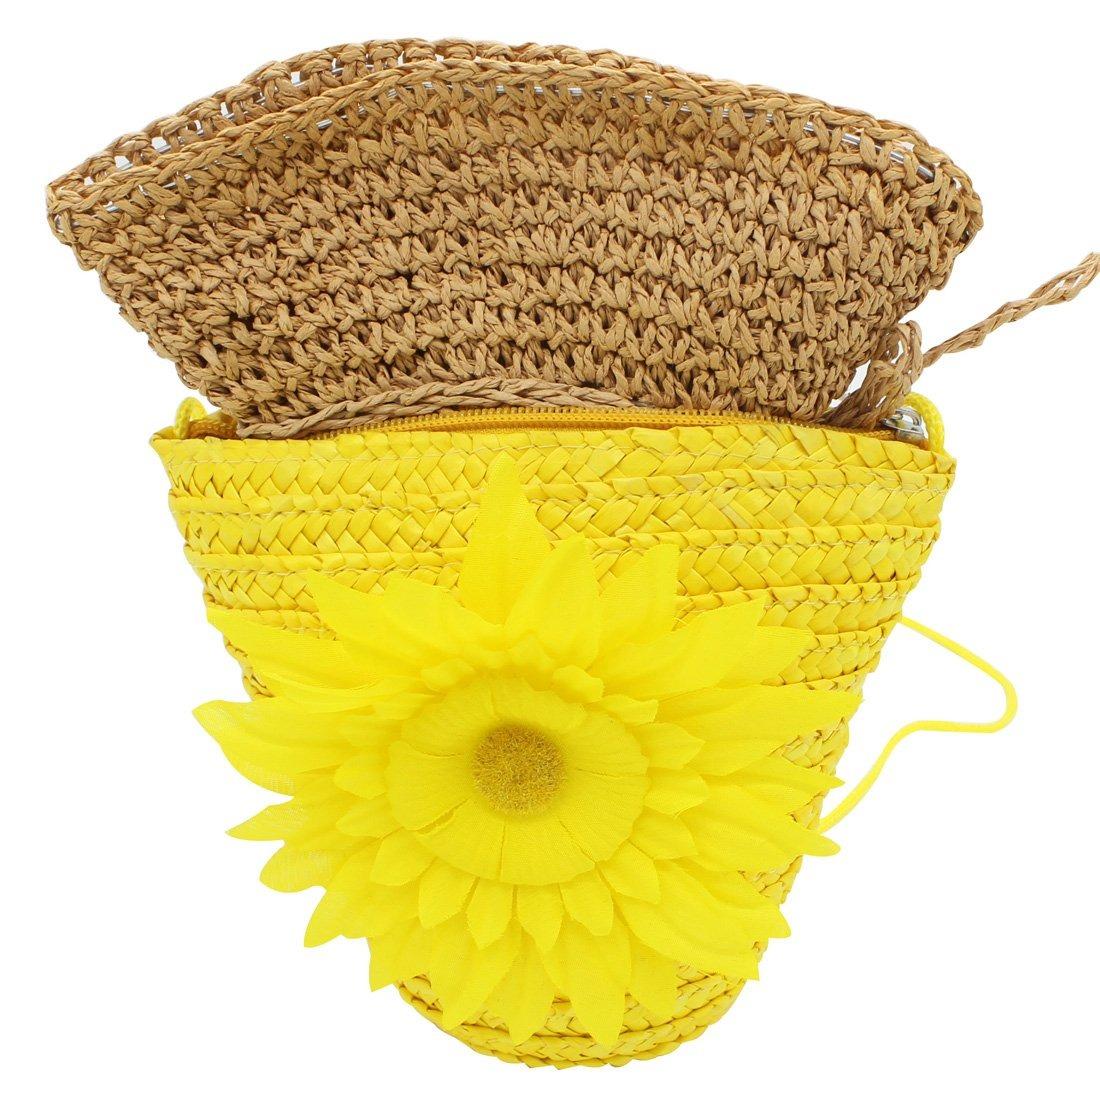 cf22d3d4a096d Gorro De Sombrero Yopindo Conjunto Sombrero De Paja Sol G -   45.679 ...